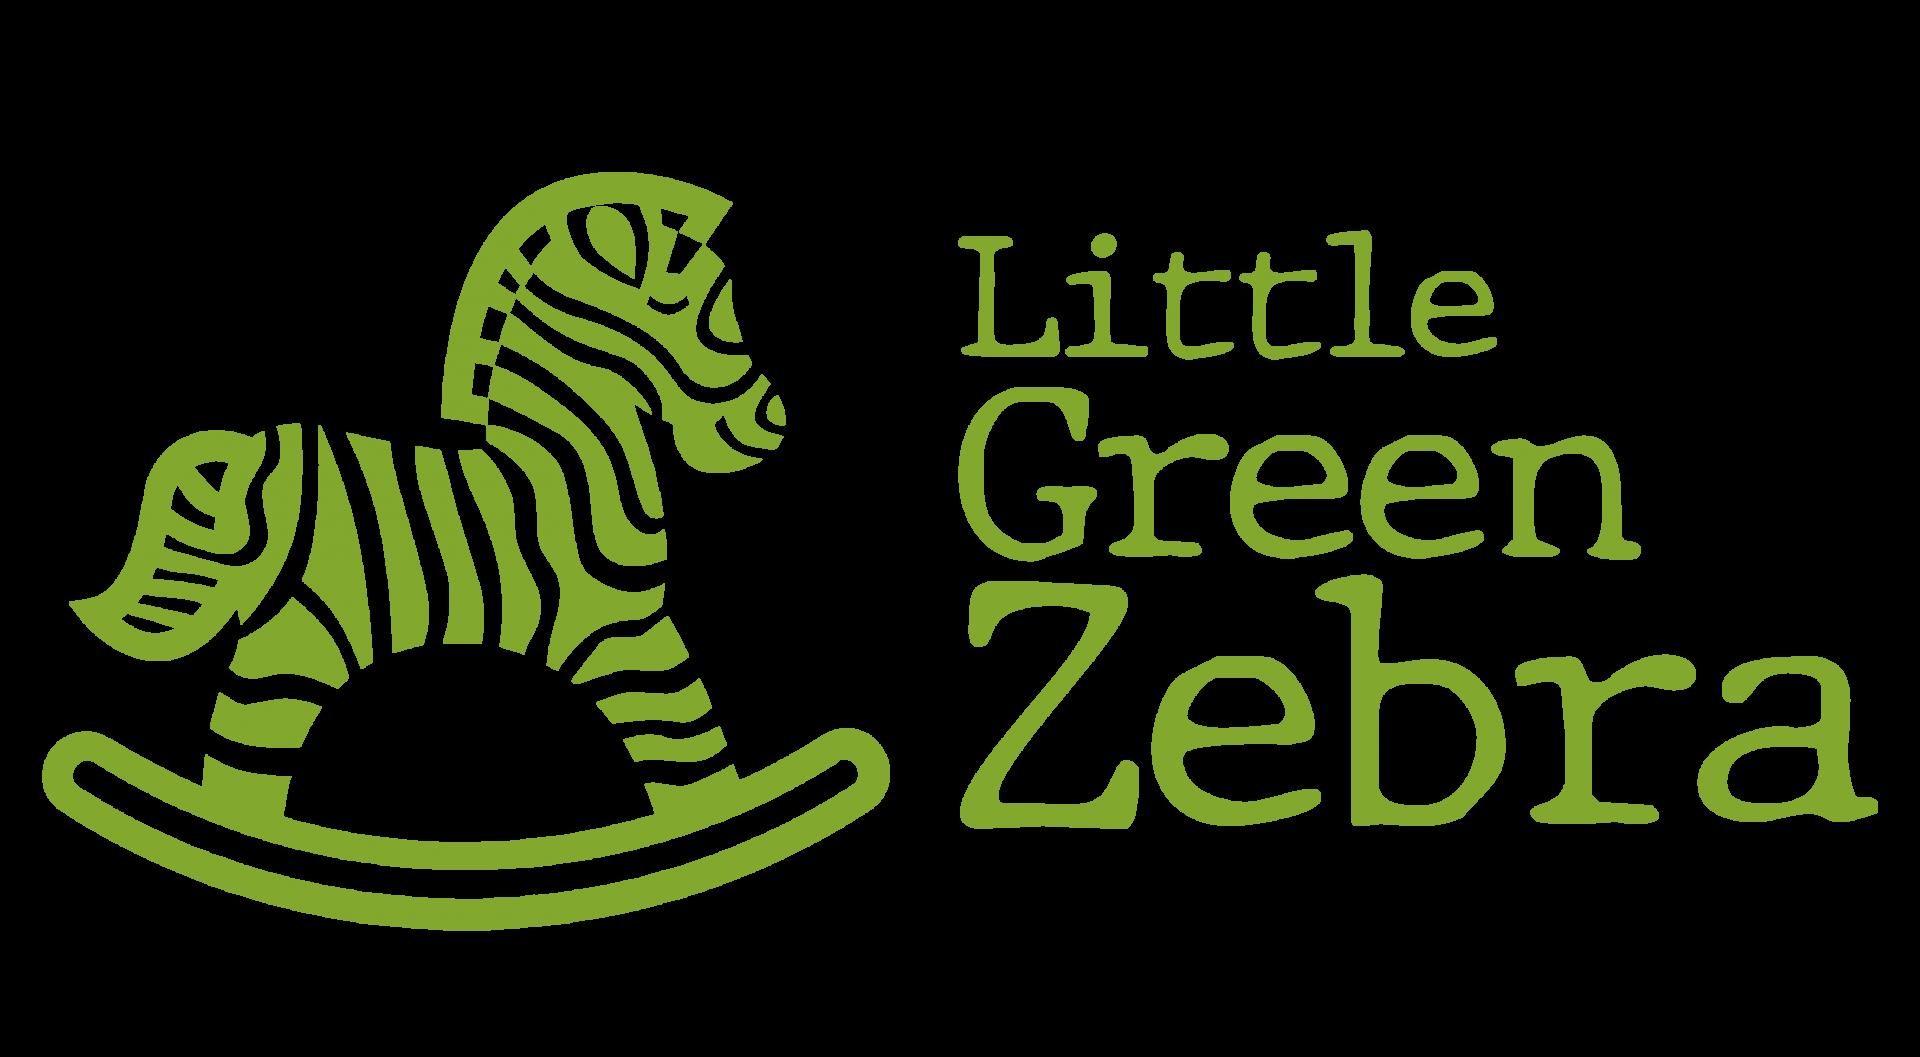 Little Green Zebra